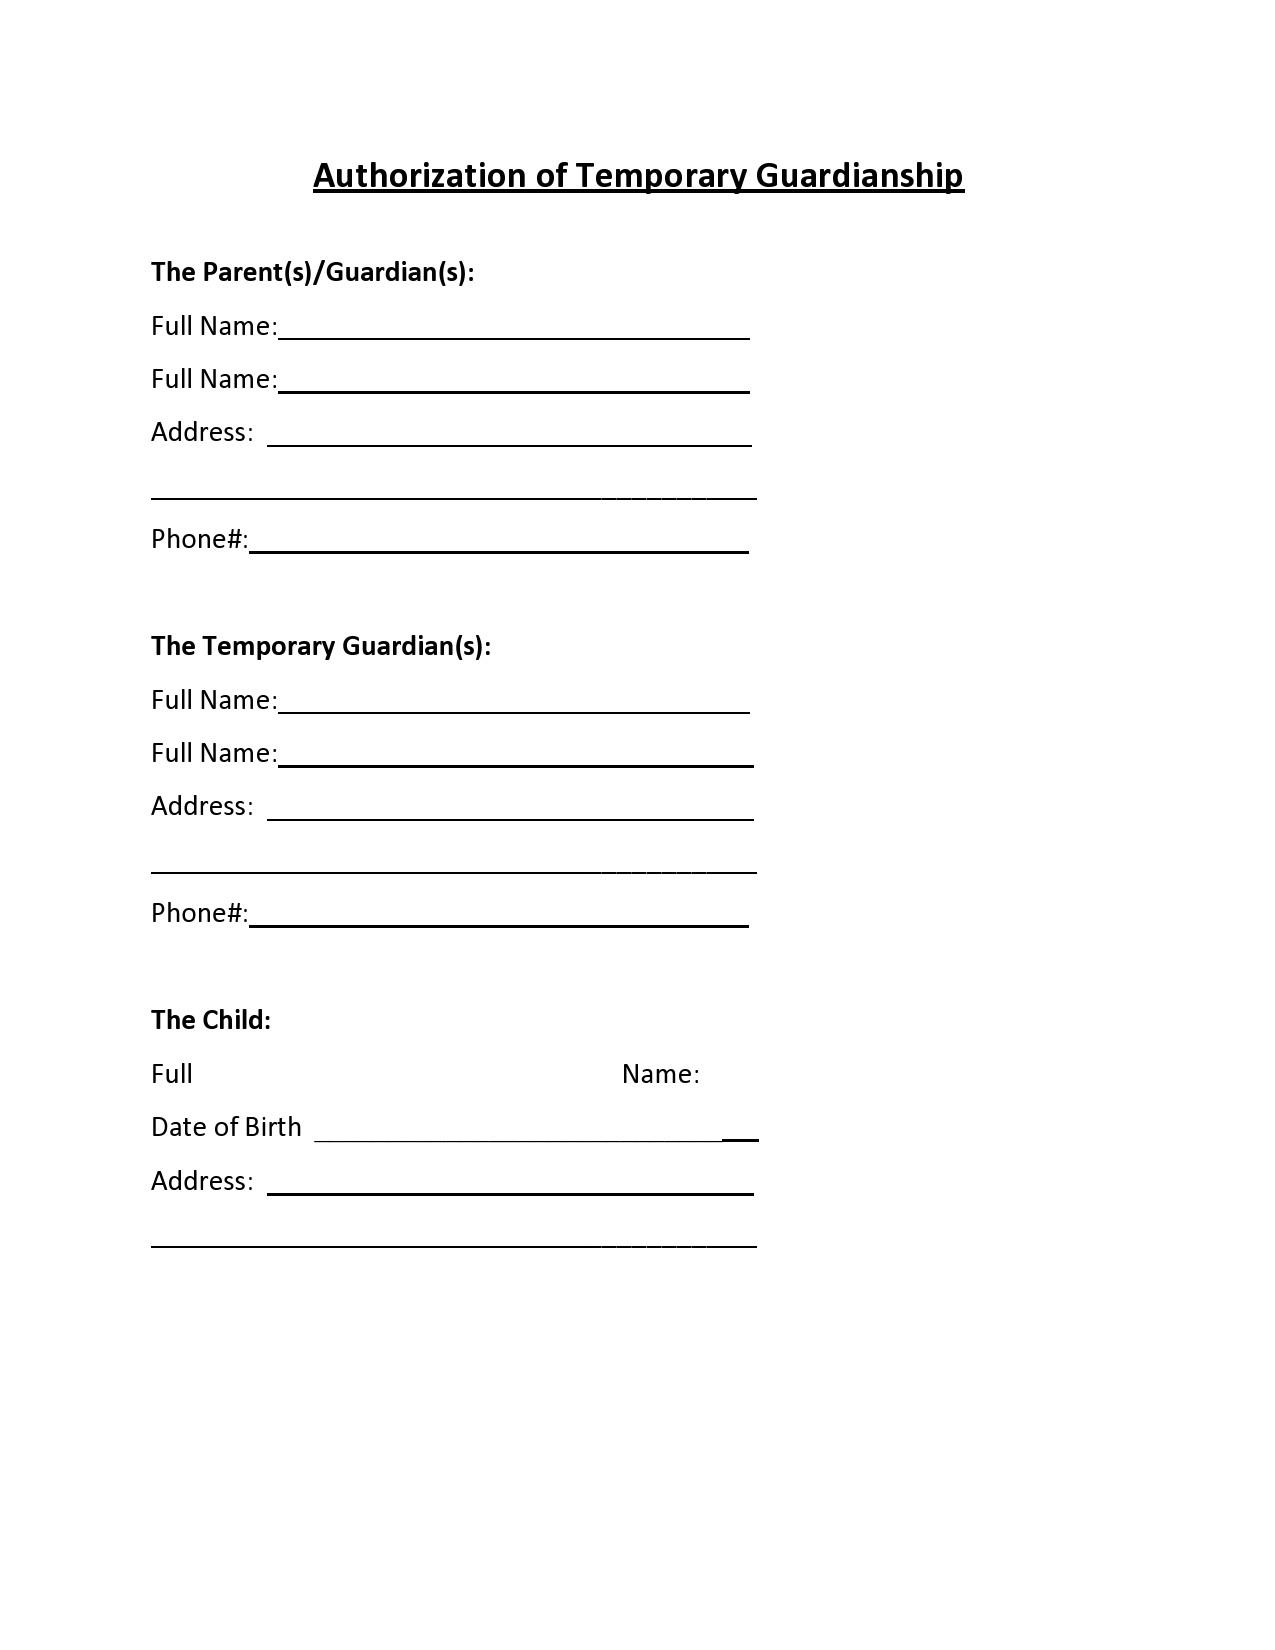 Free temporary guardianship form 36